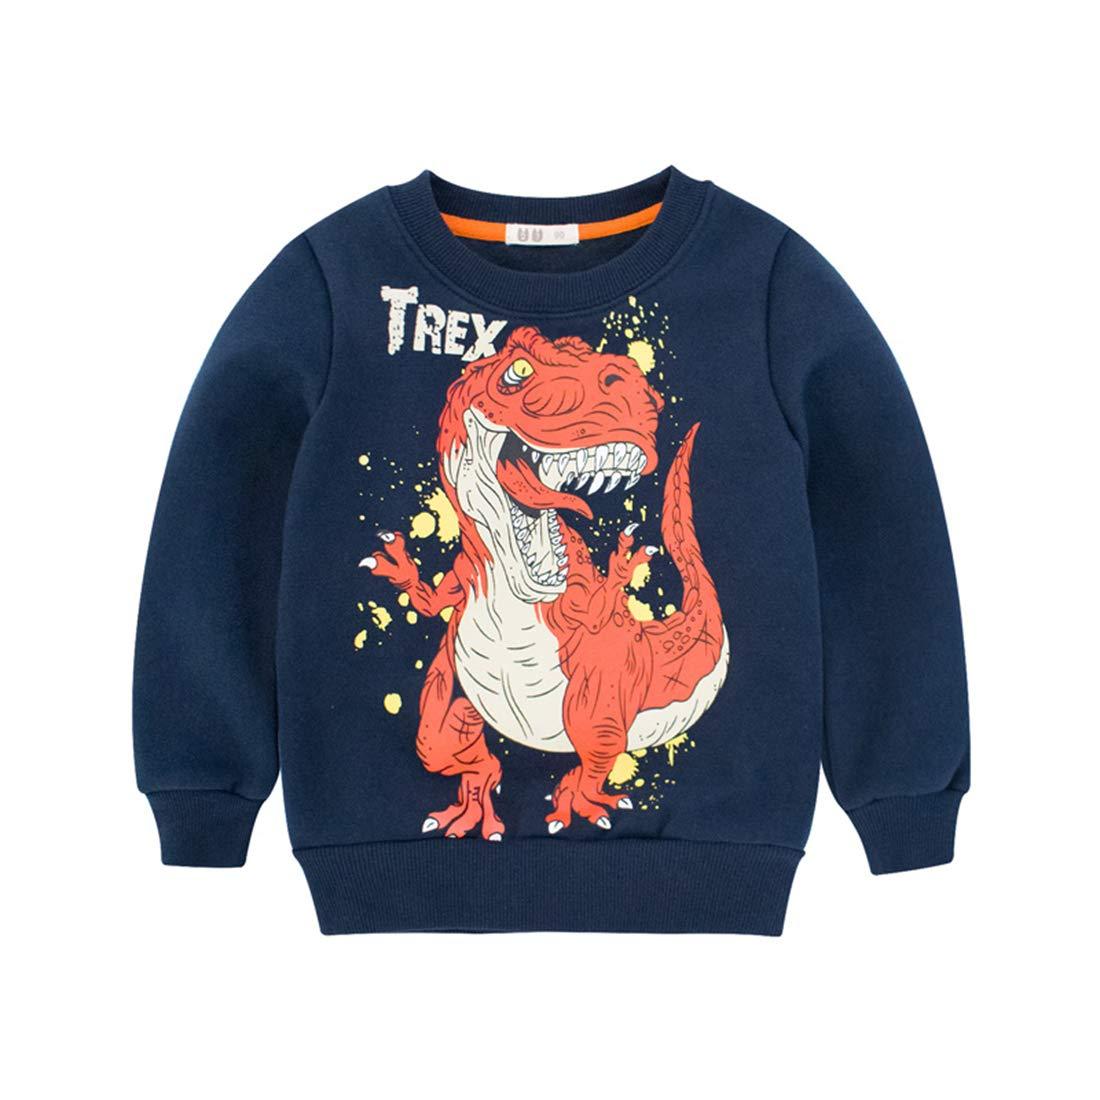 DDSOL Kid Boys Cute Dinosaur Sweatshirt Long Sleeve Crewneck Fleeces Pullover Toddler Cotton Tee Shirt Top 2T-8T